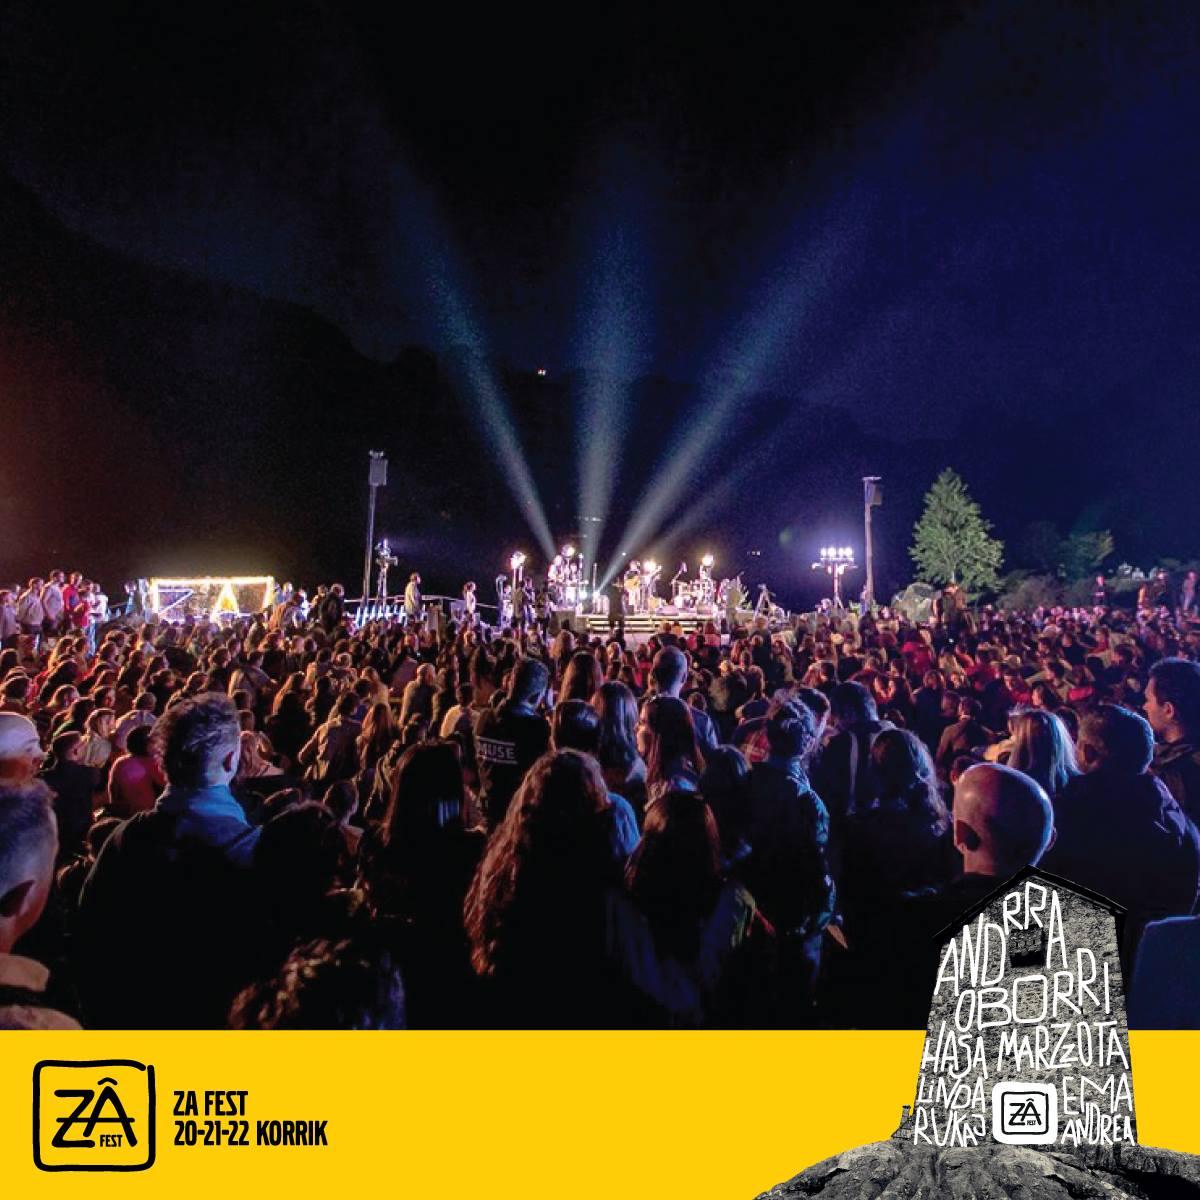 Za Festival 2